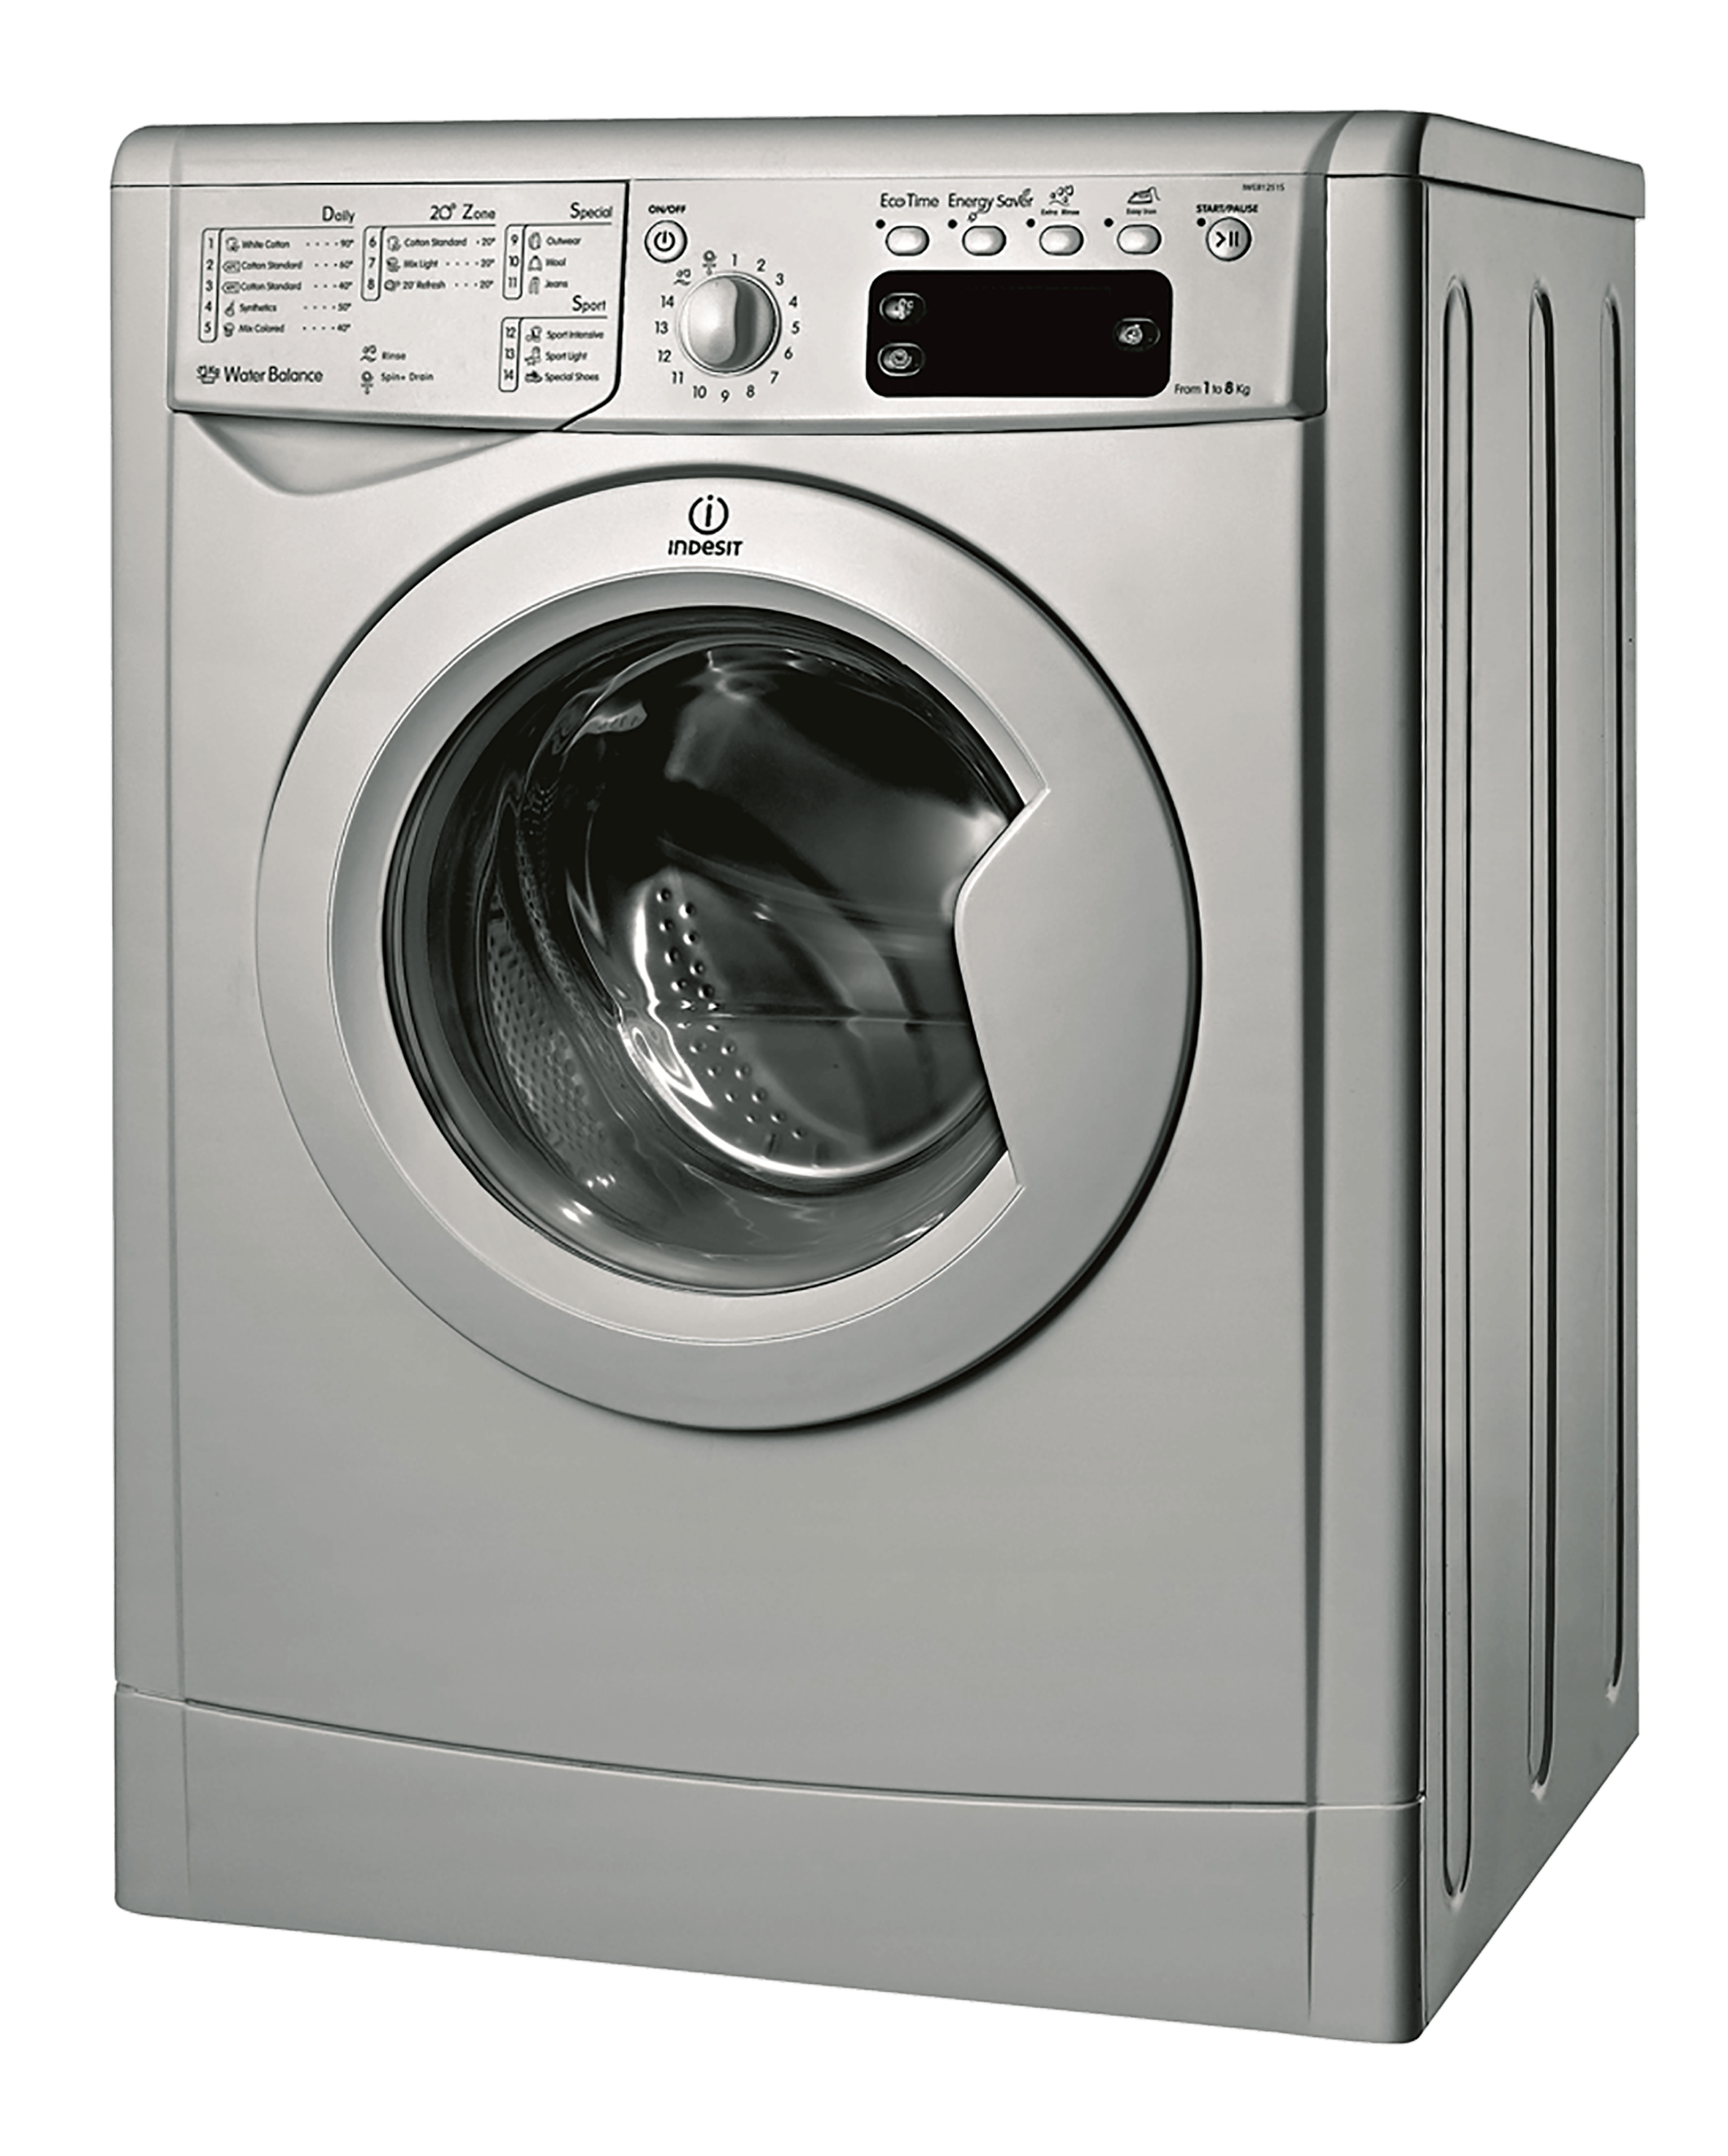 Washing machine transparent image   Washing machine   Pinterest ...